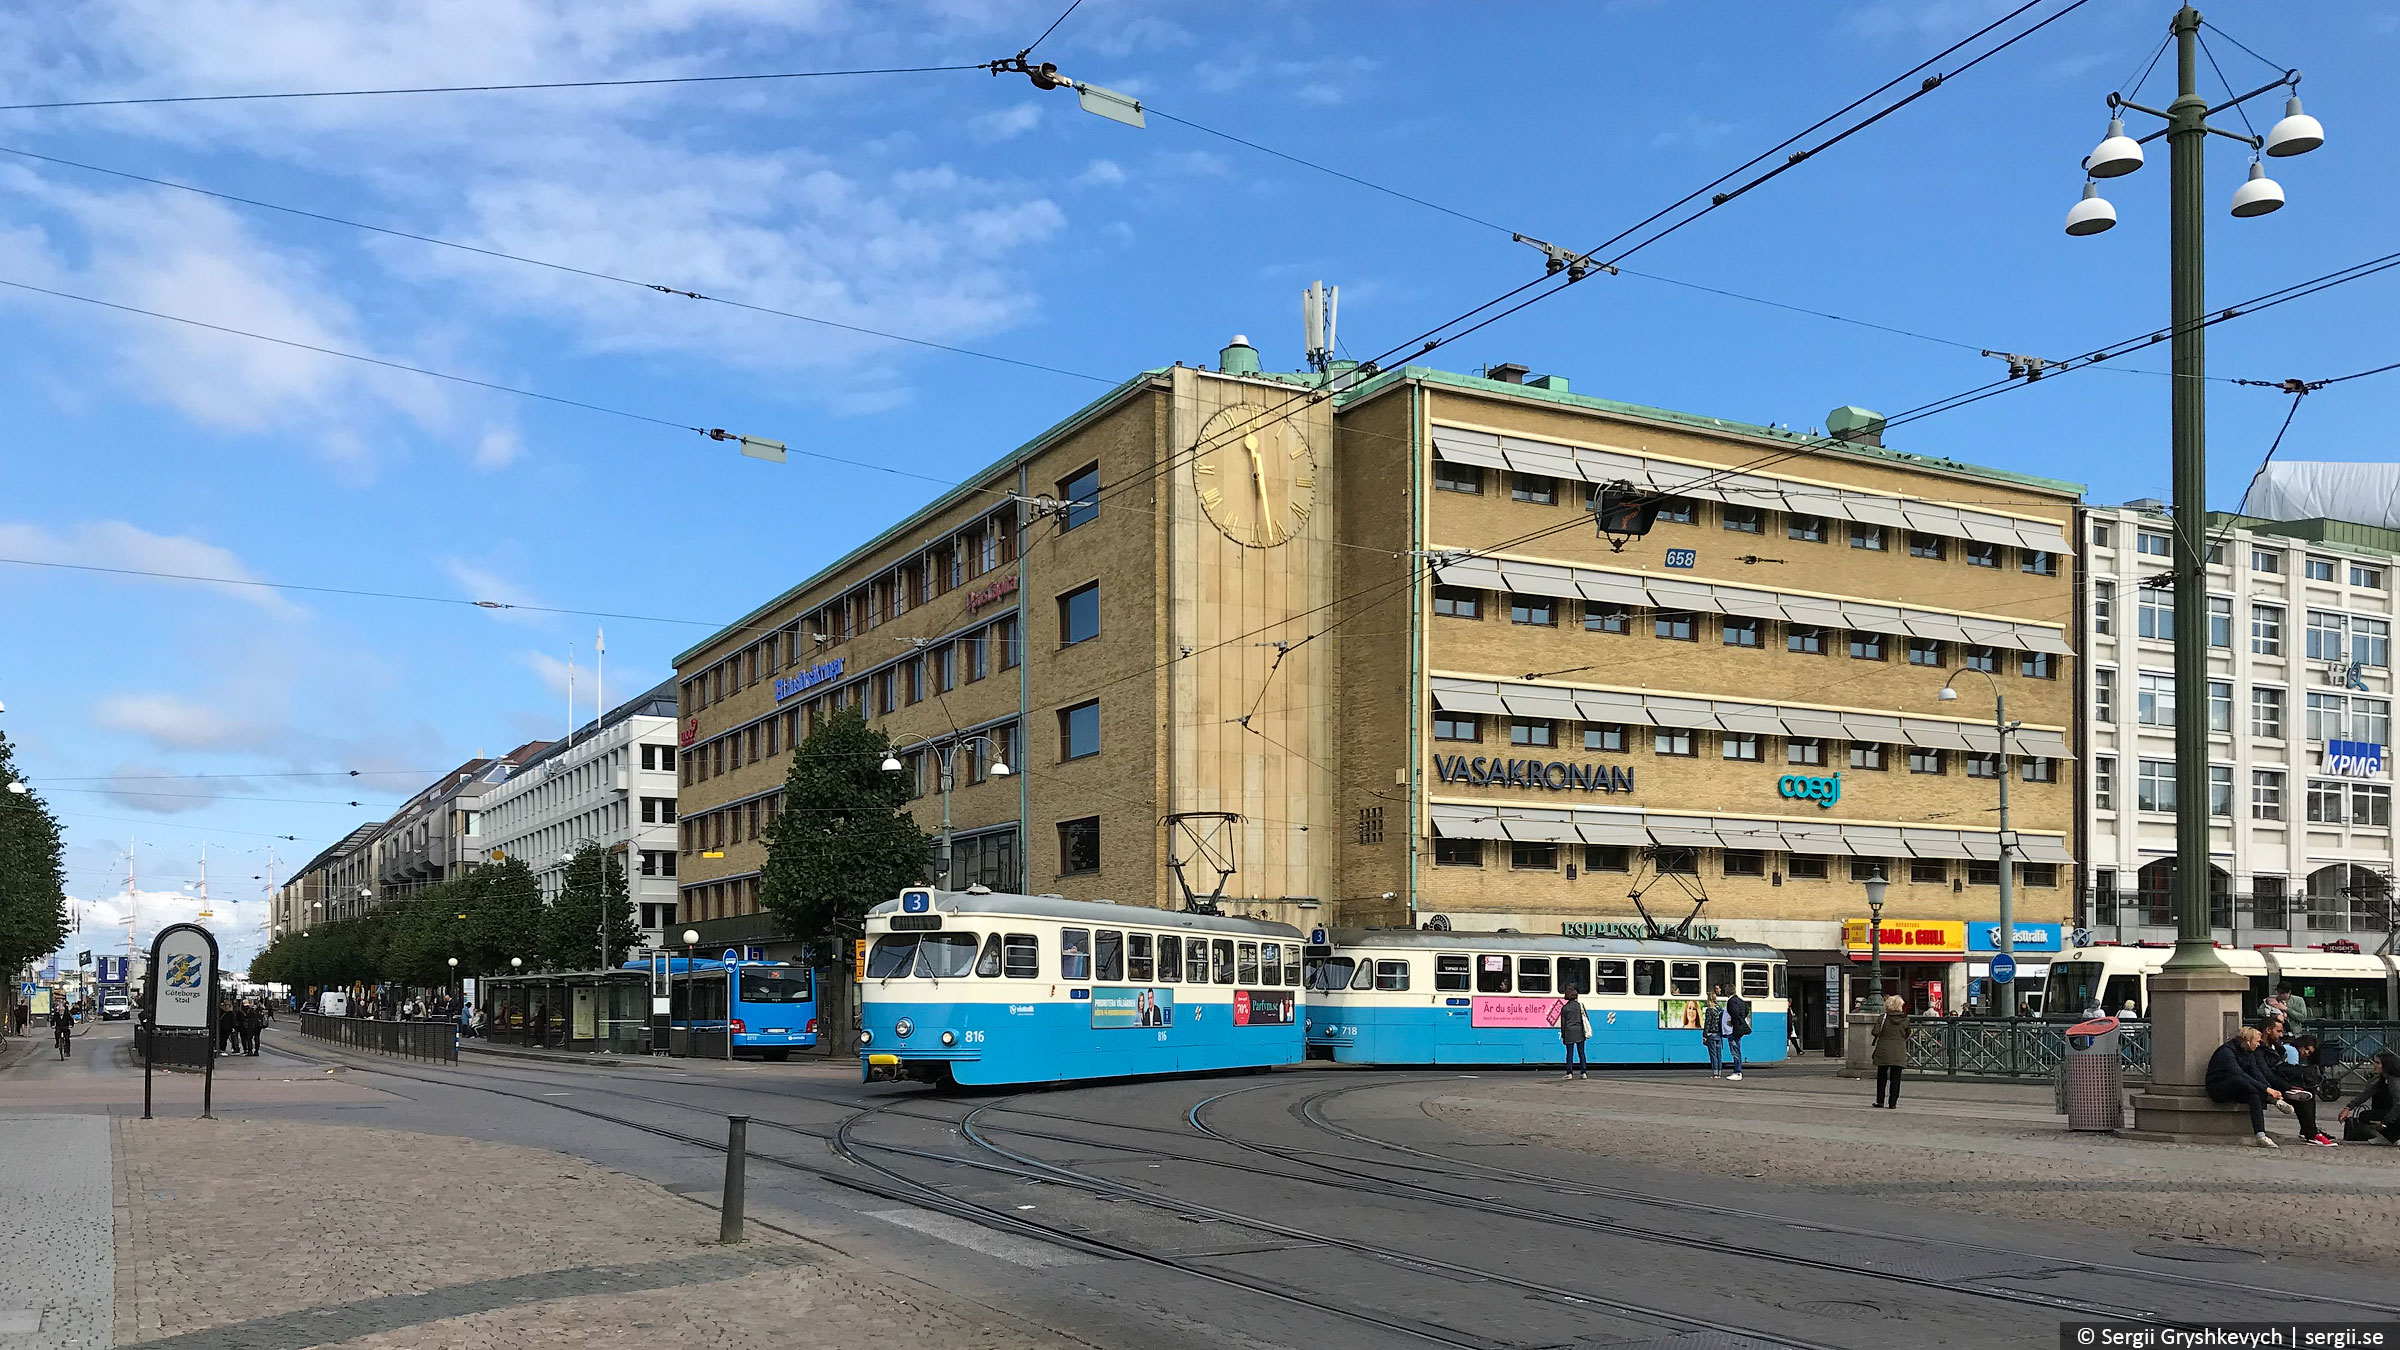 göteborg-ghotenburg-sweden-2018-20